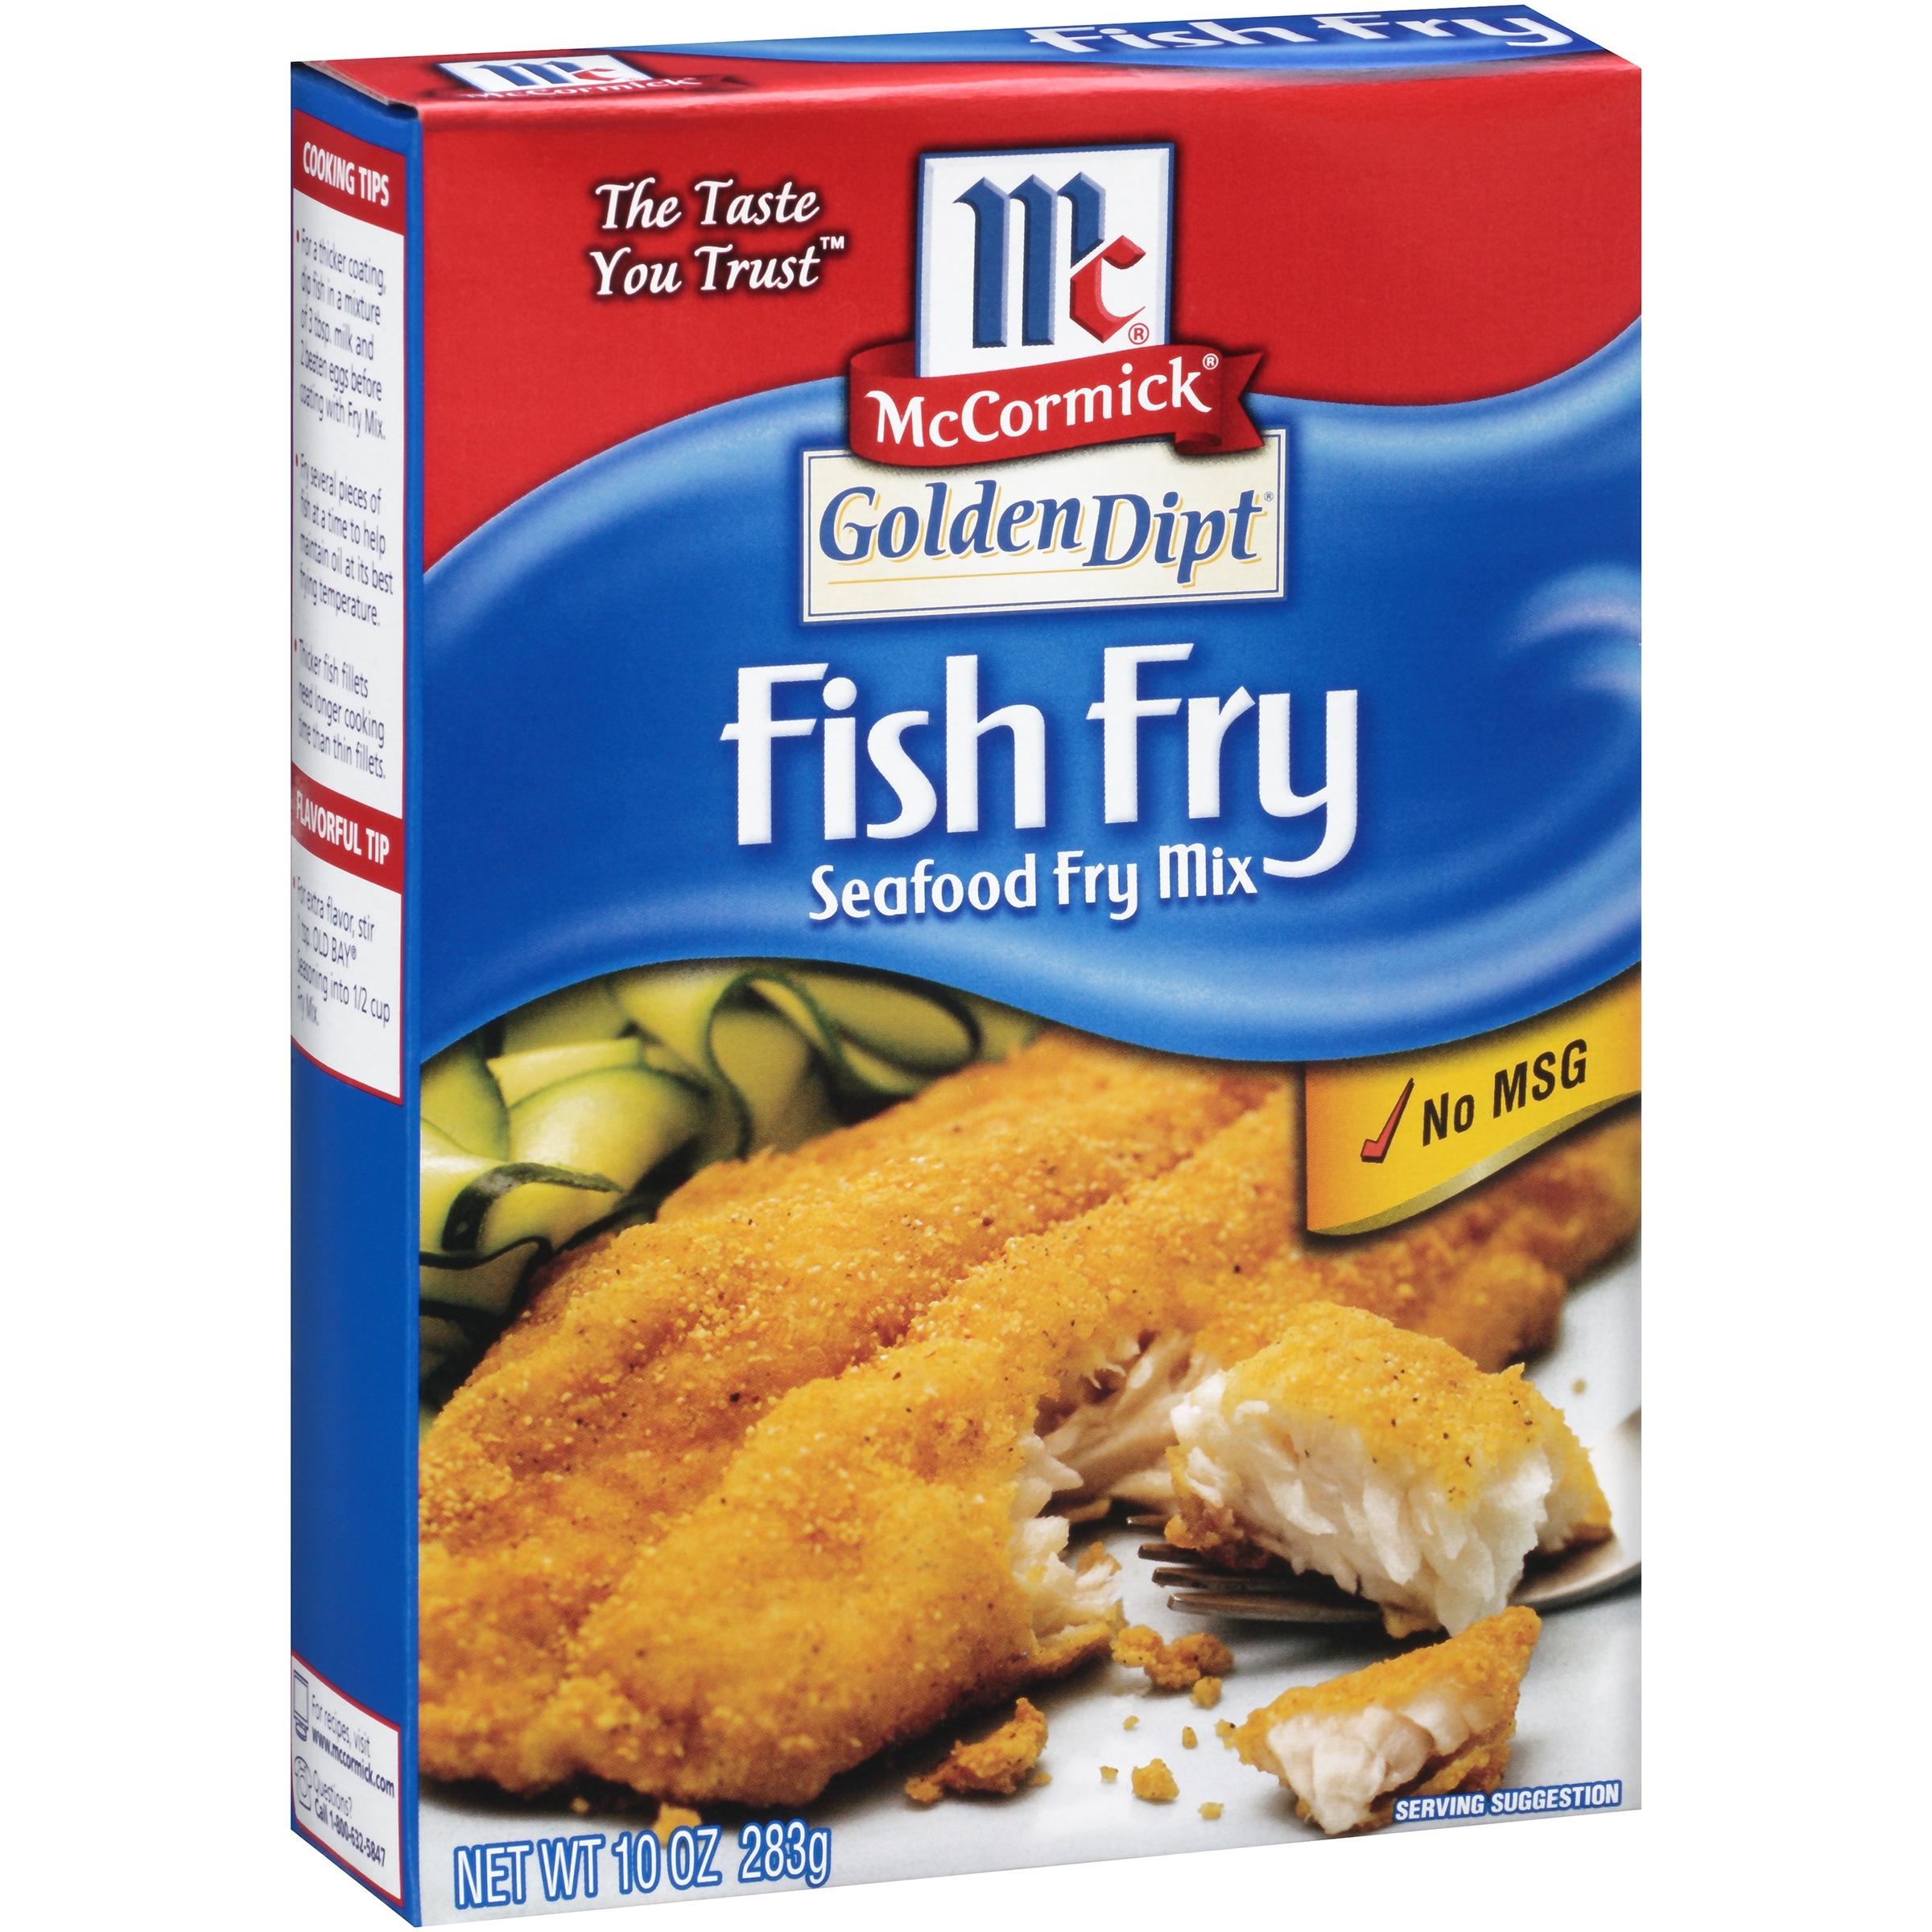 Mccormick golden dipt fish fry mix 10 oz box moms for Fish fry mix